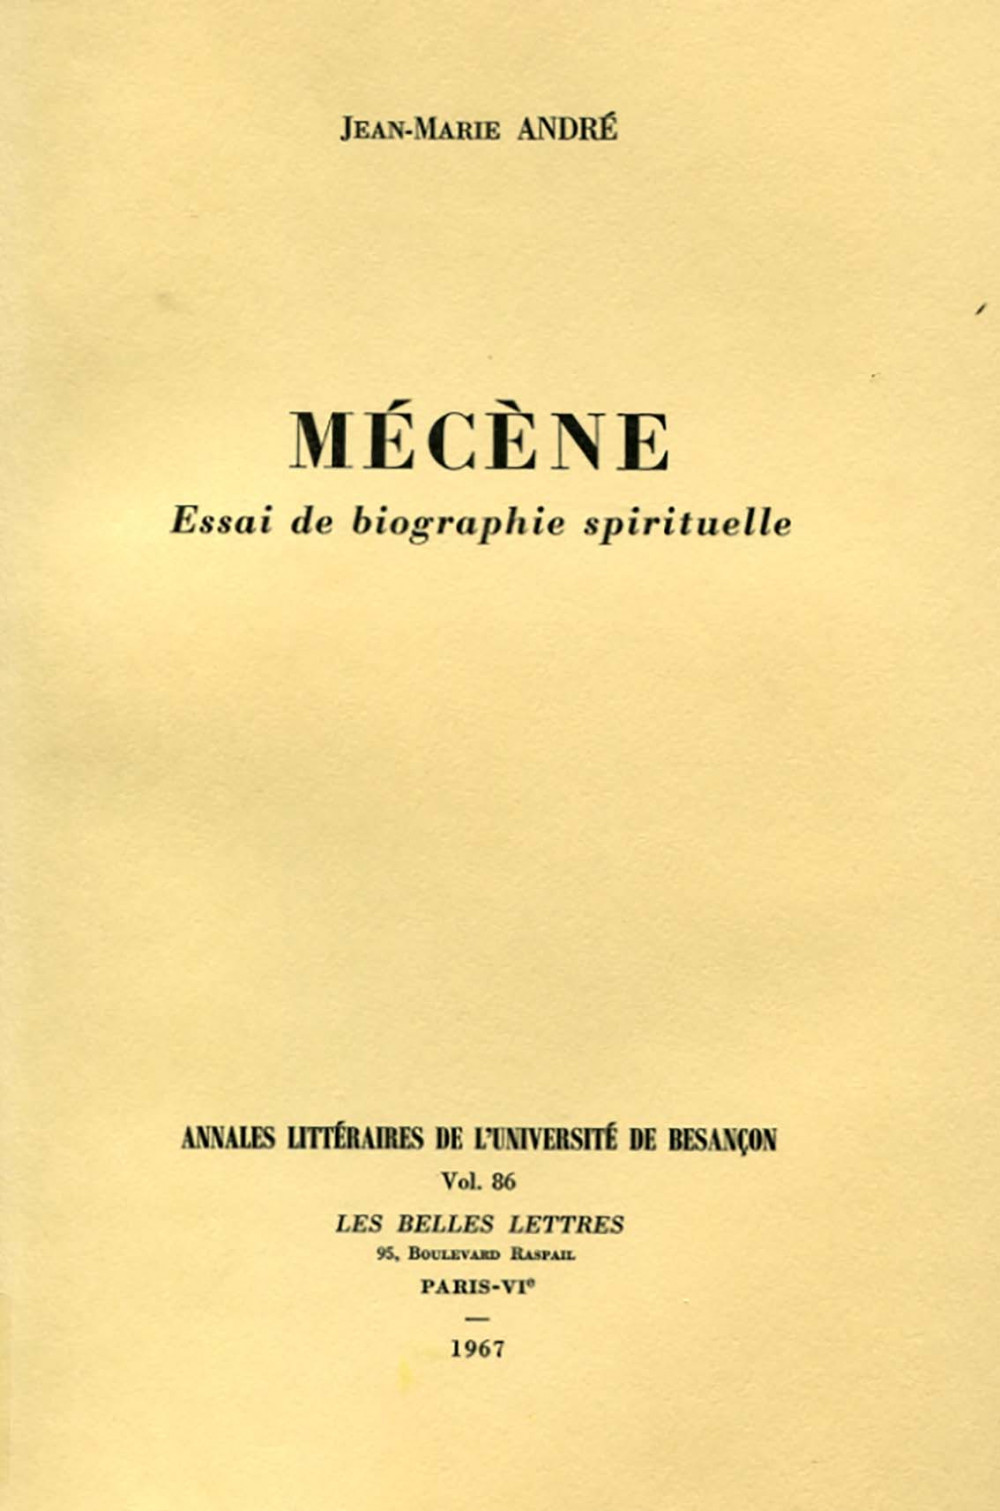 Mécène. Essai de biographie spirituelle